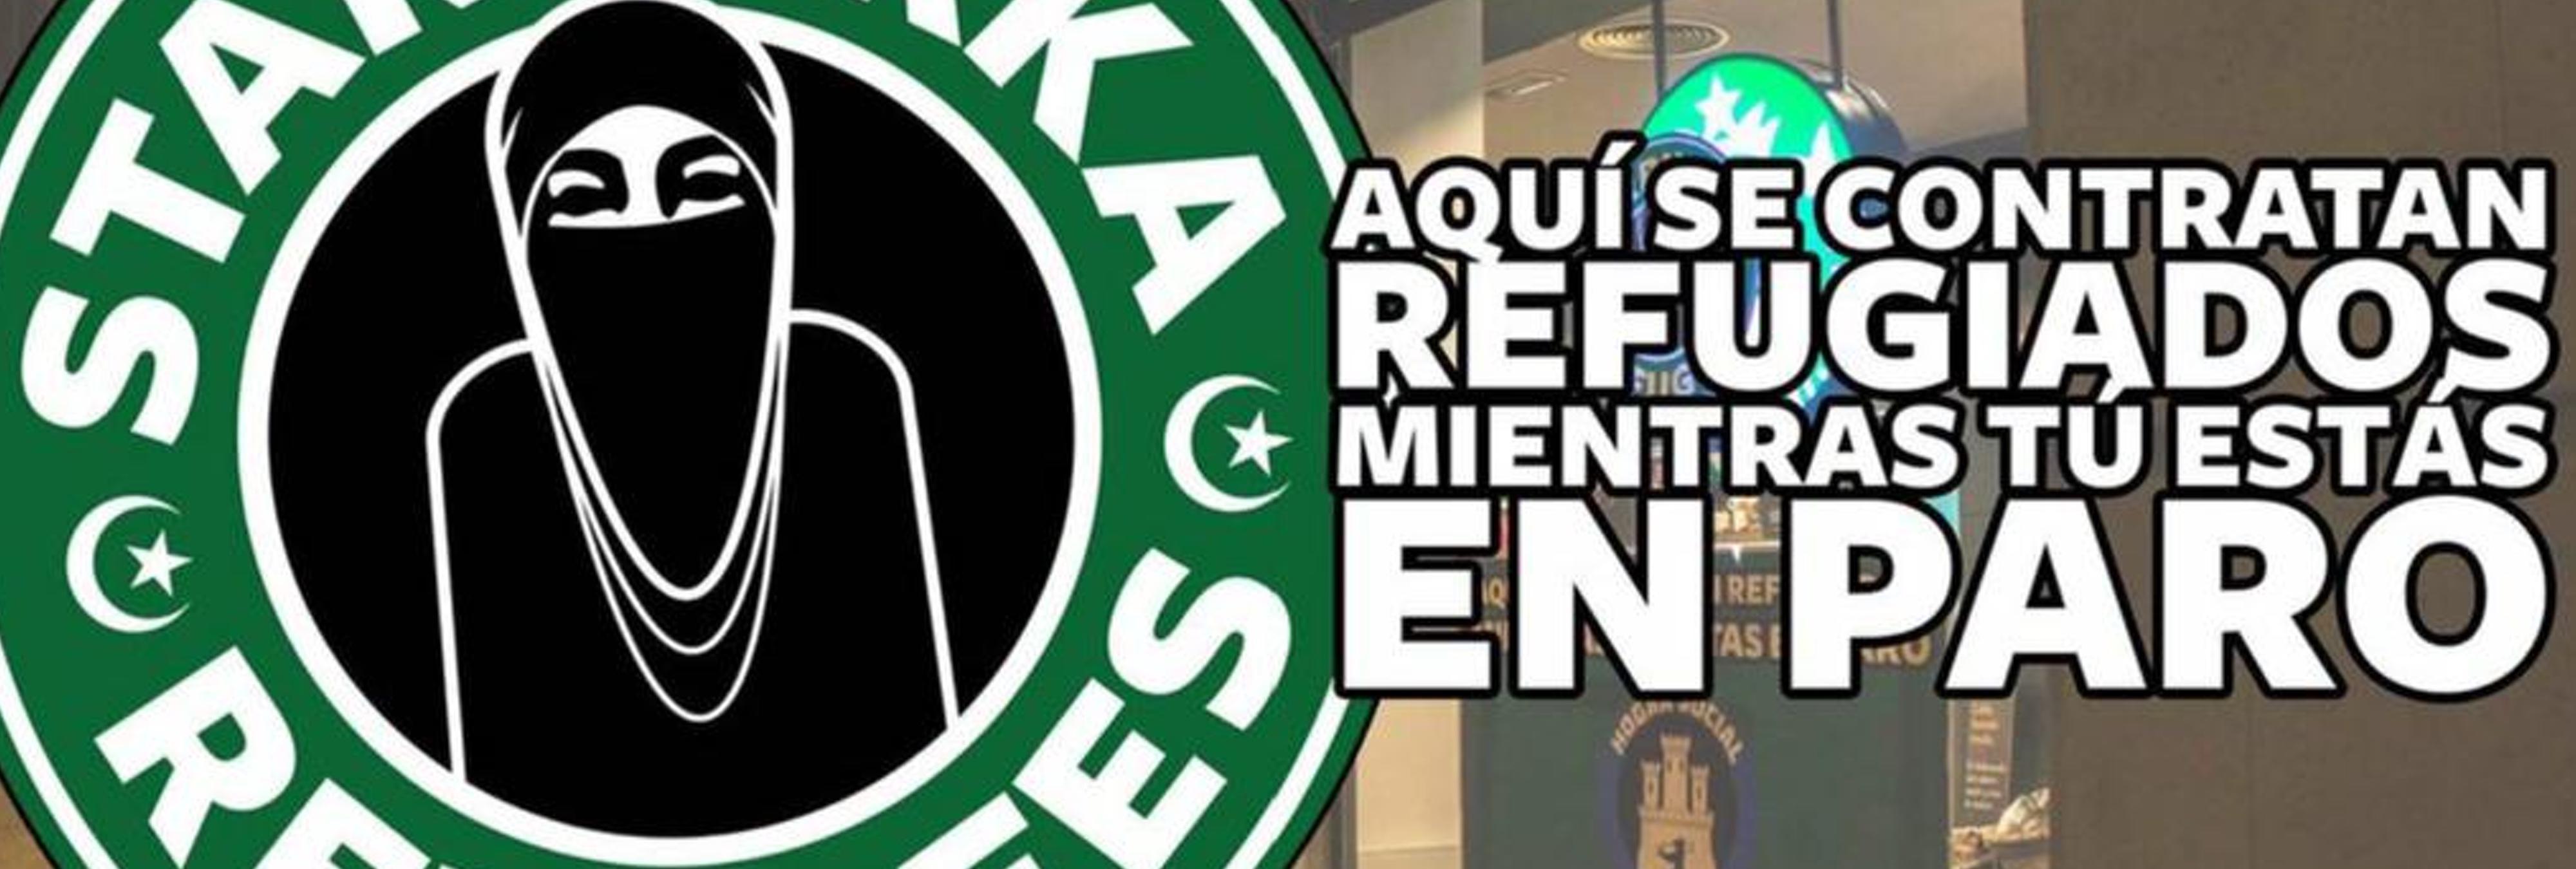 Los neonazis de Hogar Social atacan a Starbucks por dar trabajo a refugiados